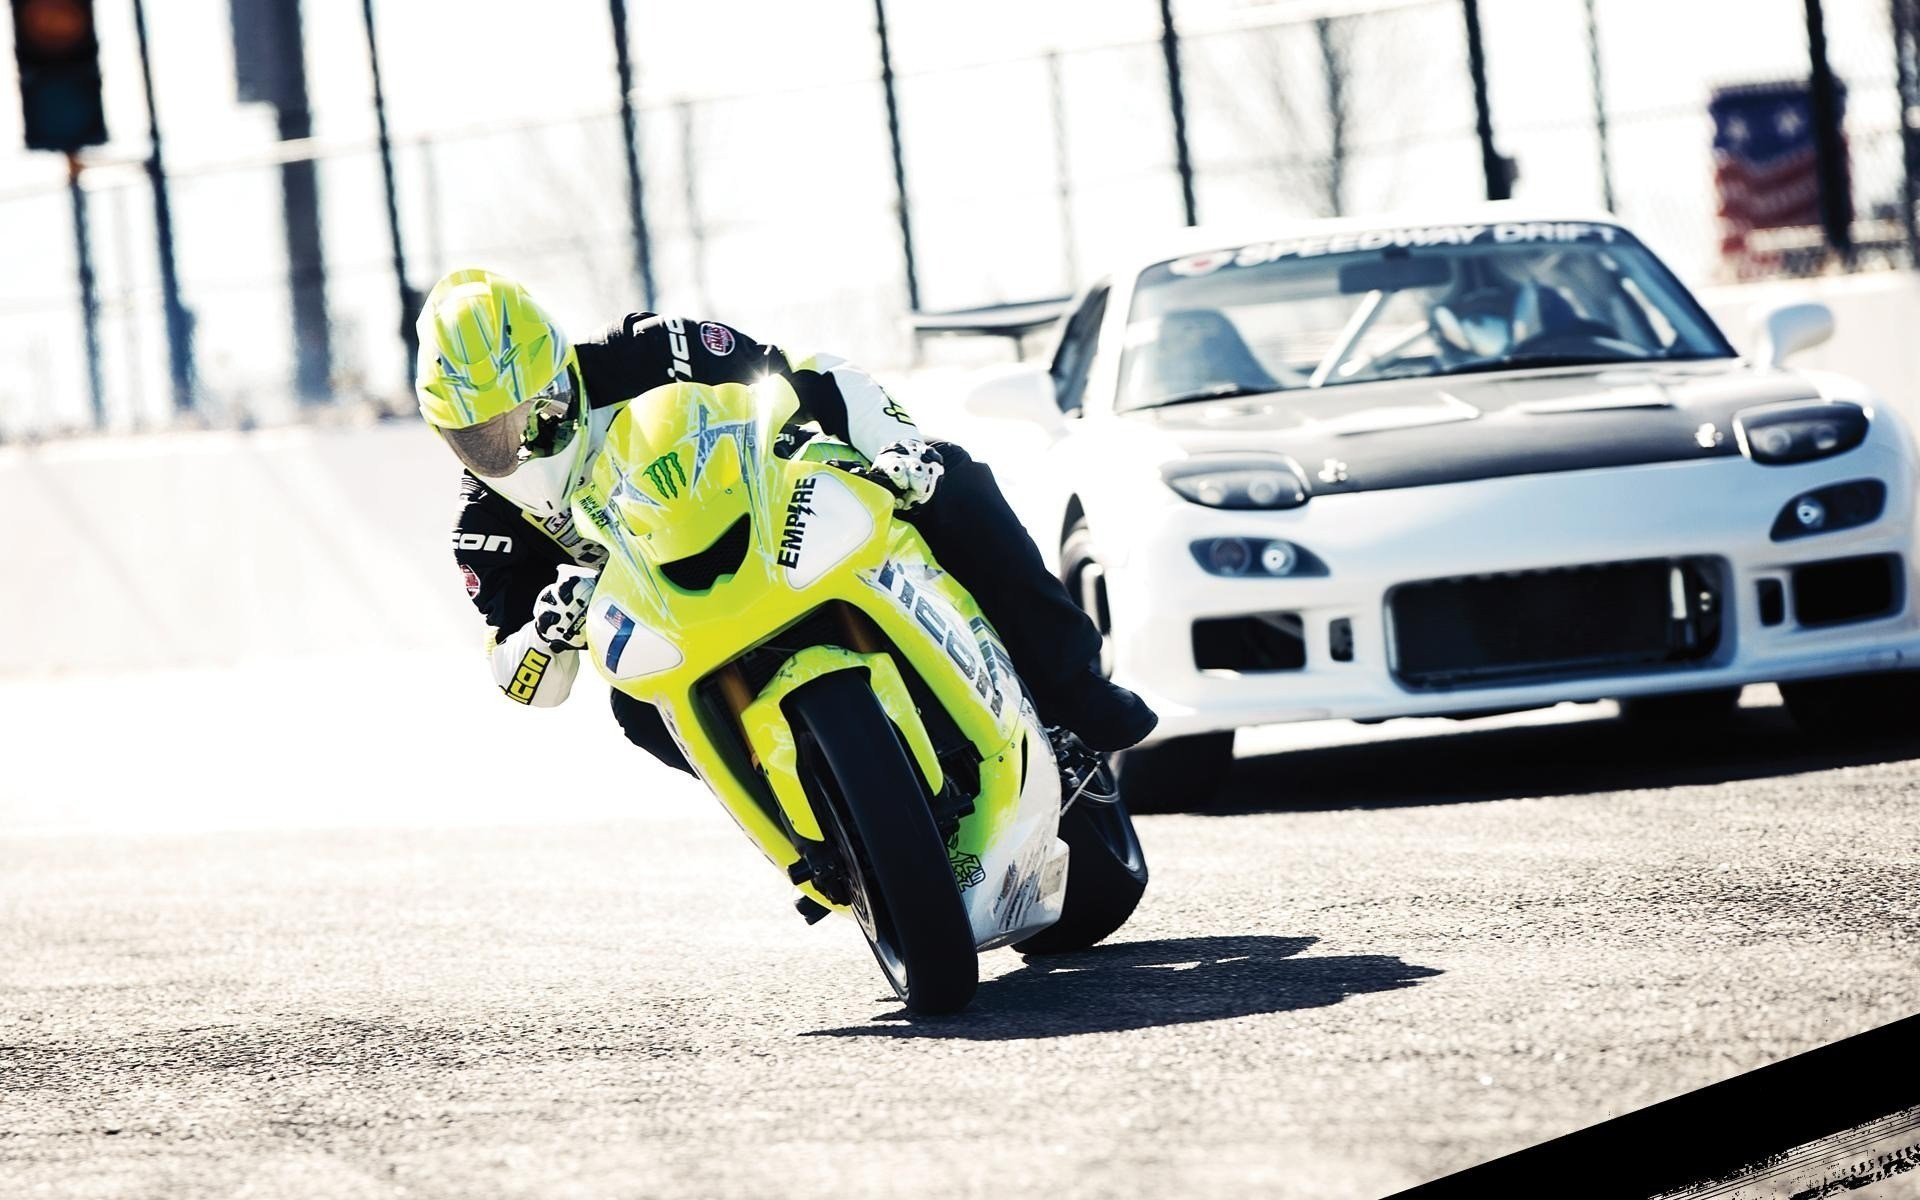 Mazda RX7 Drift vs Motorcycle